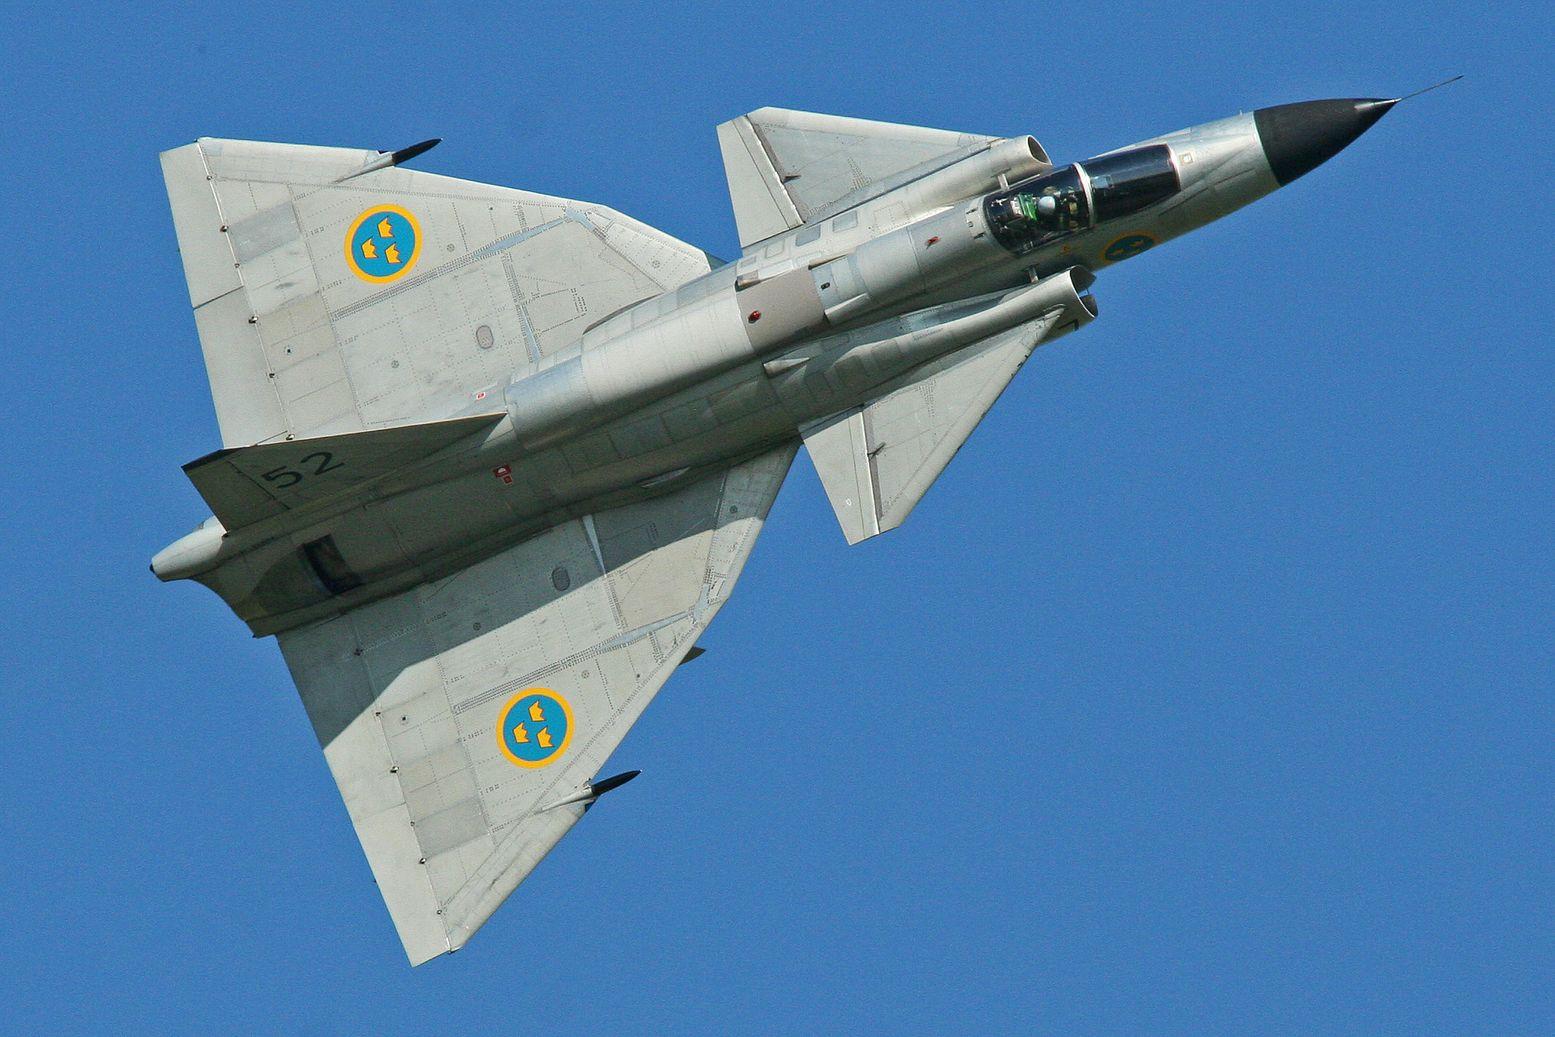 Cold War Showdown: The Swedish JA-37 Viggen vs The SR-71 Blackbird